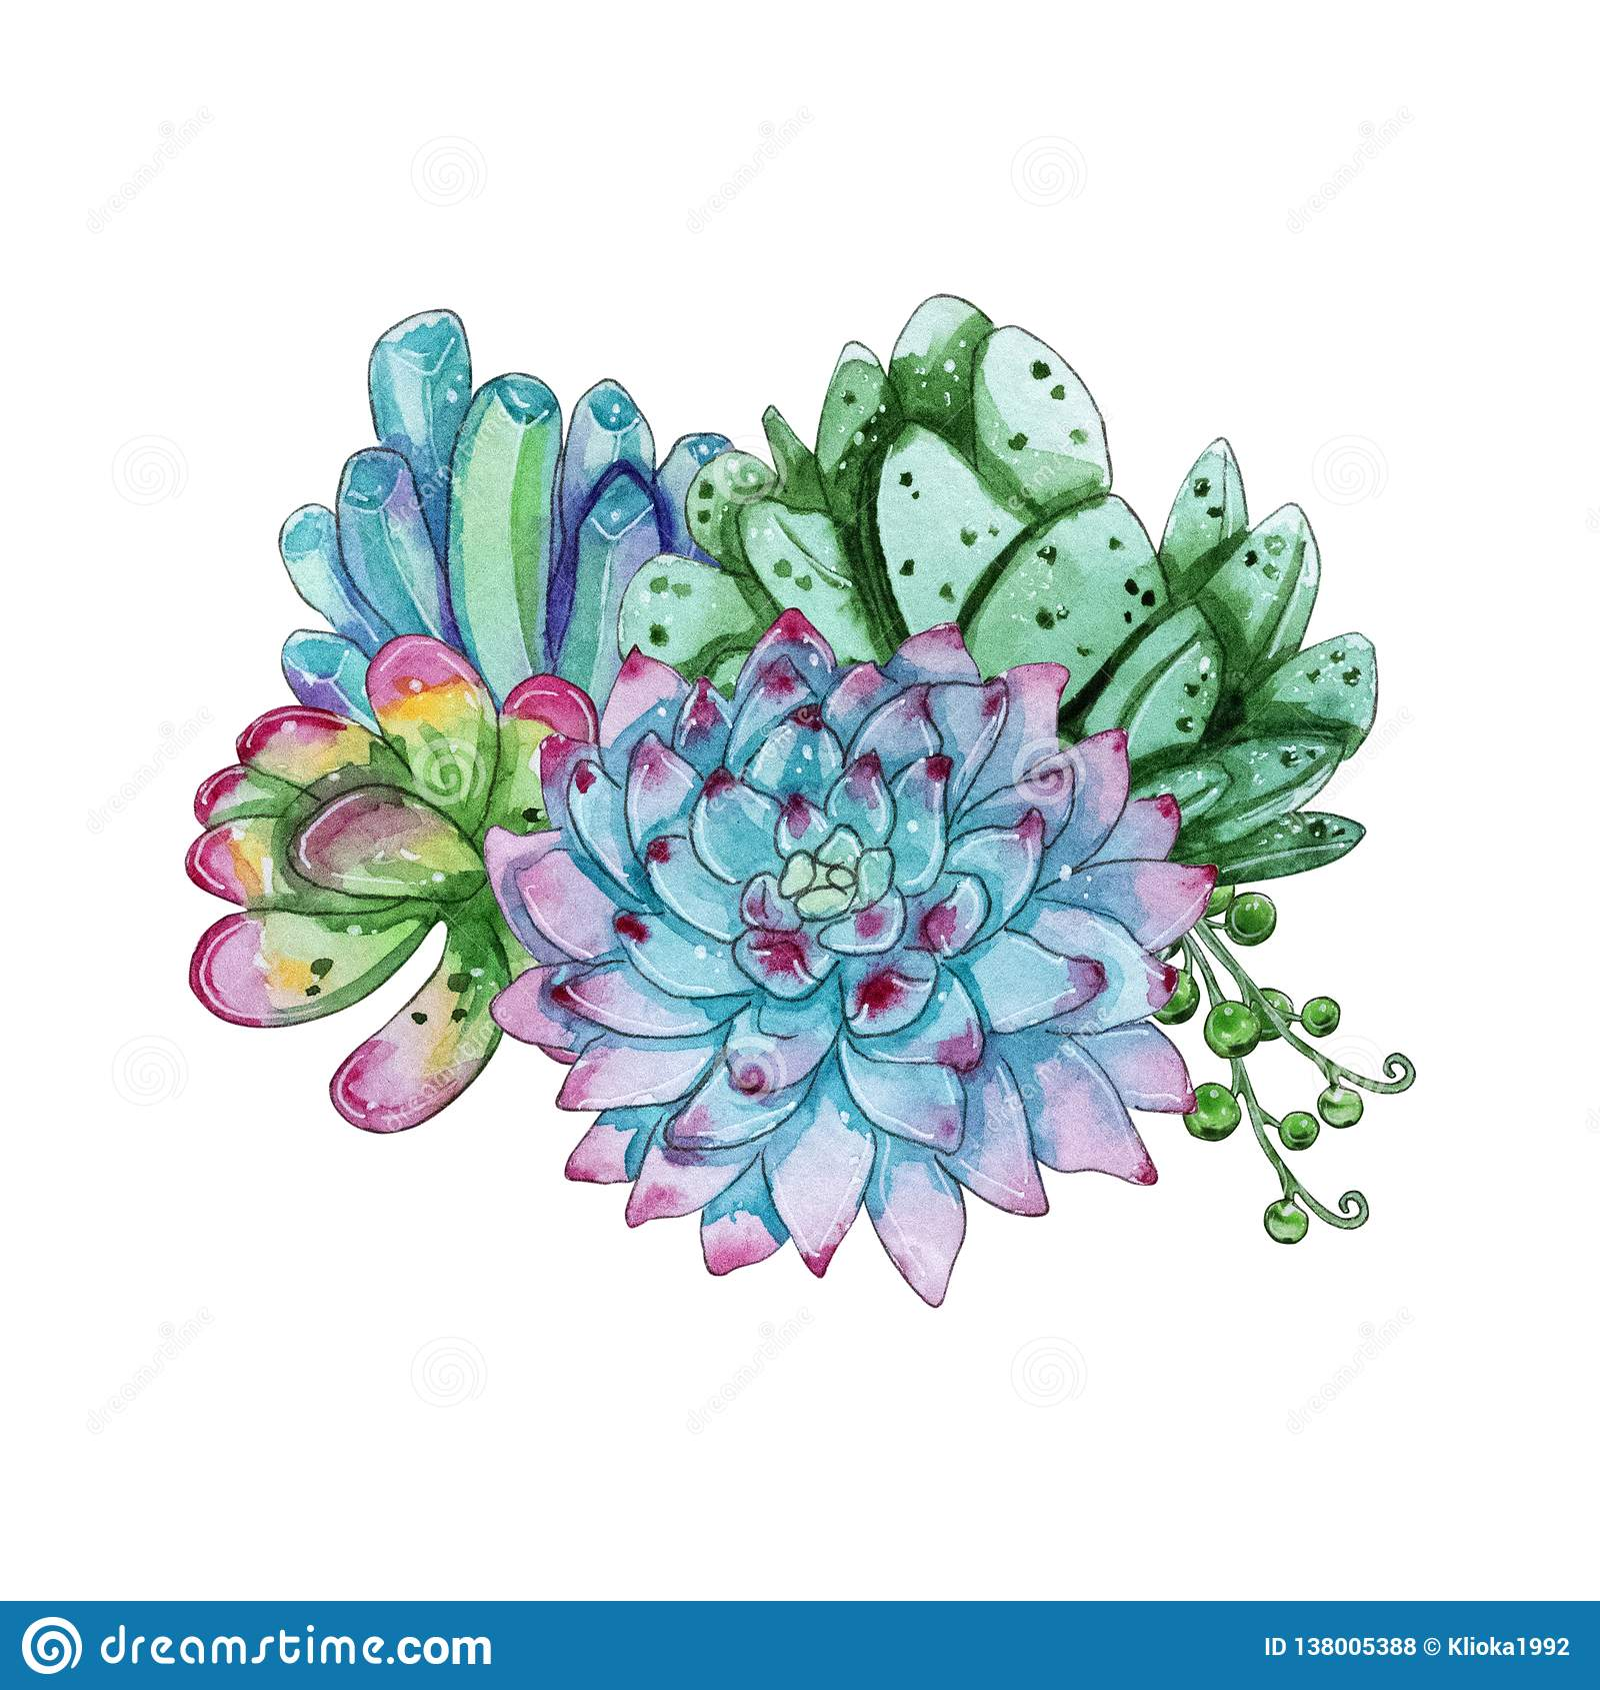 Watercolor Handpainted Succulent Plant Composition Stock Illustration Illustration Of Cartoon Composition 138005388